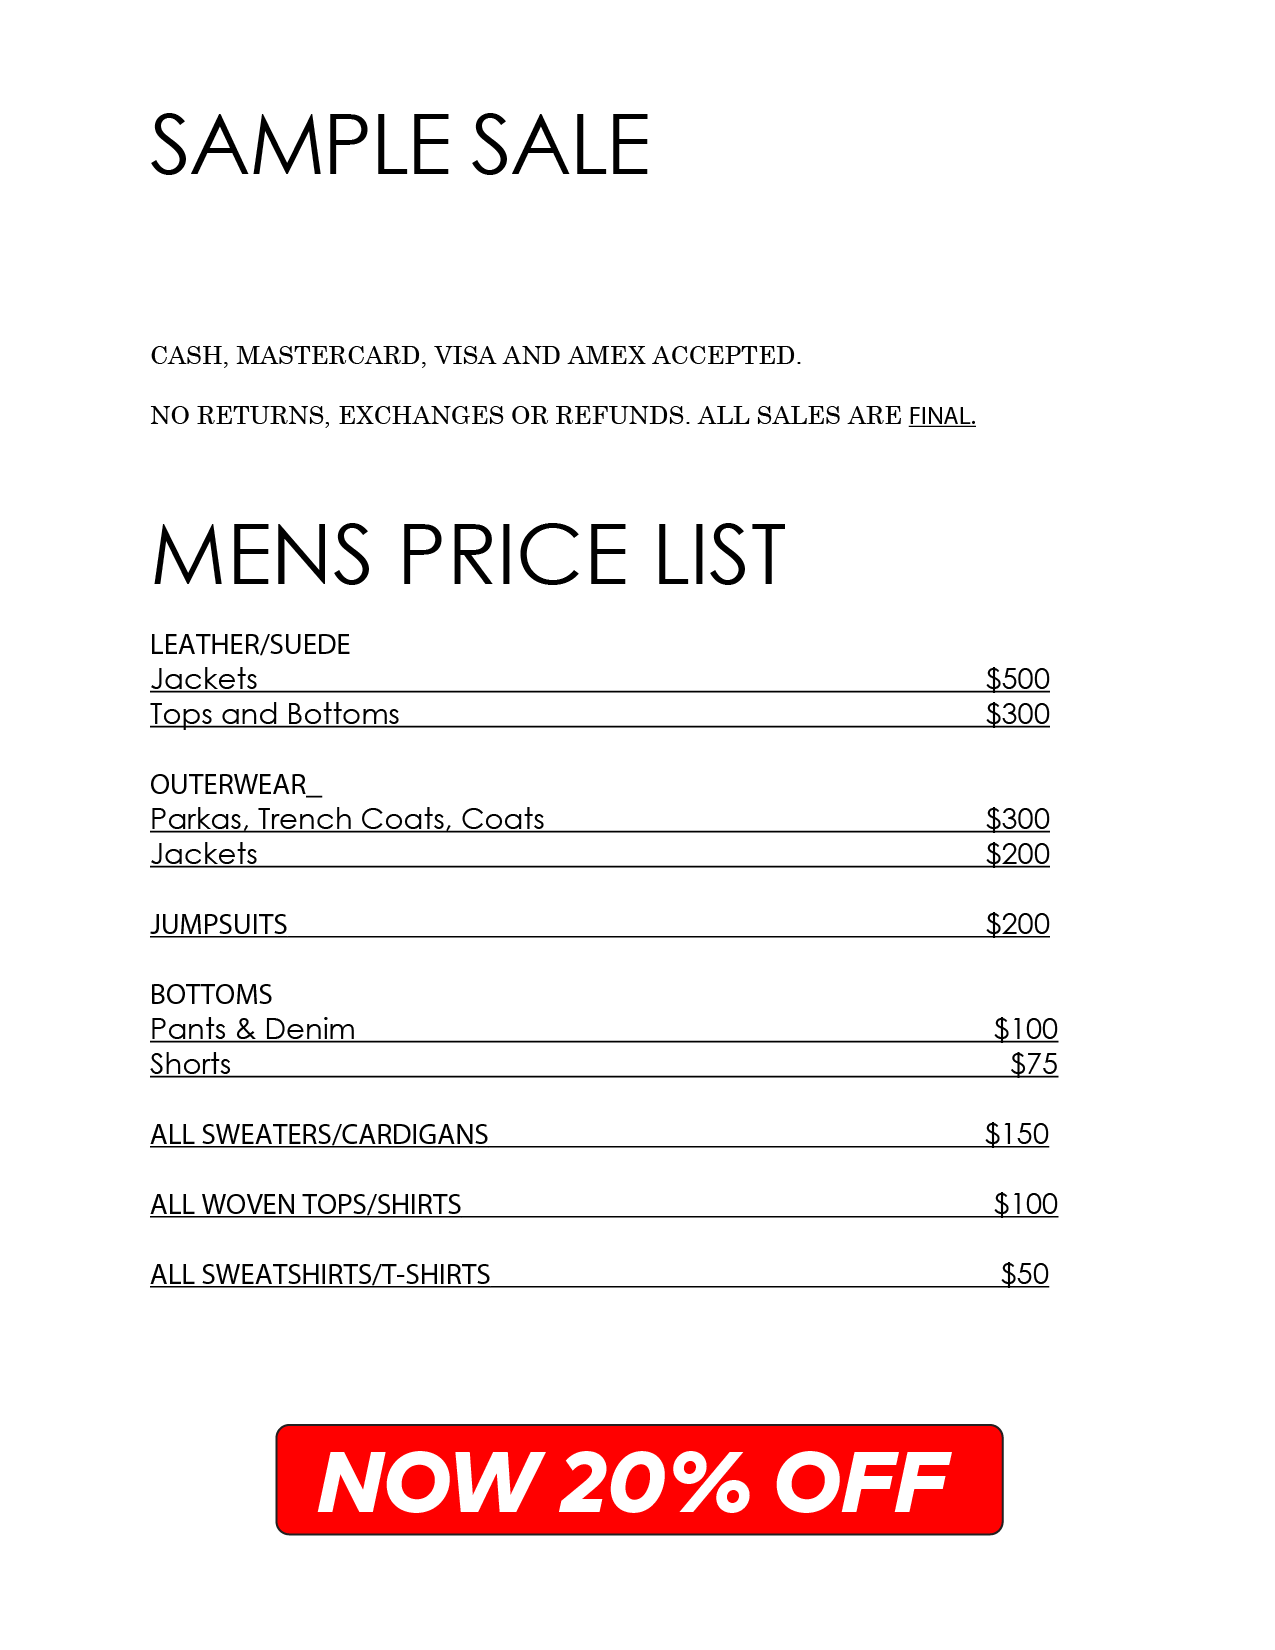 Sample Sale Mens Price List April 2019 (002)-01.png